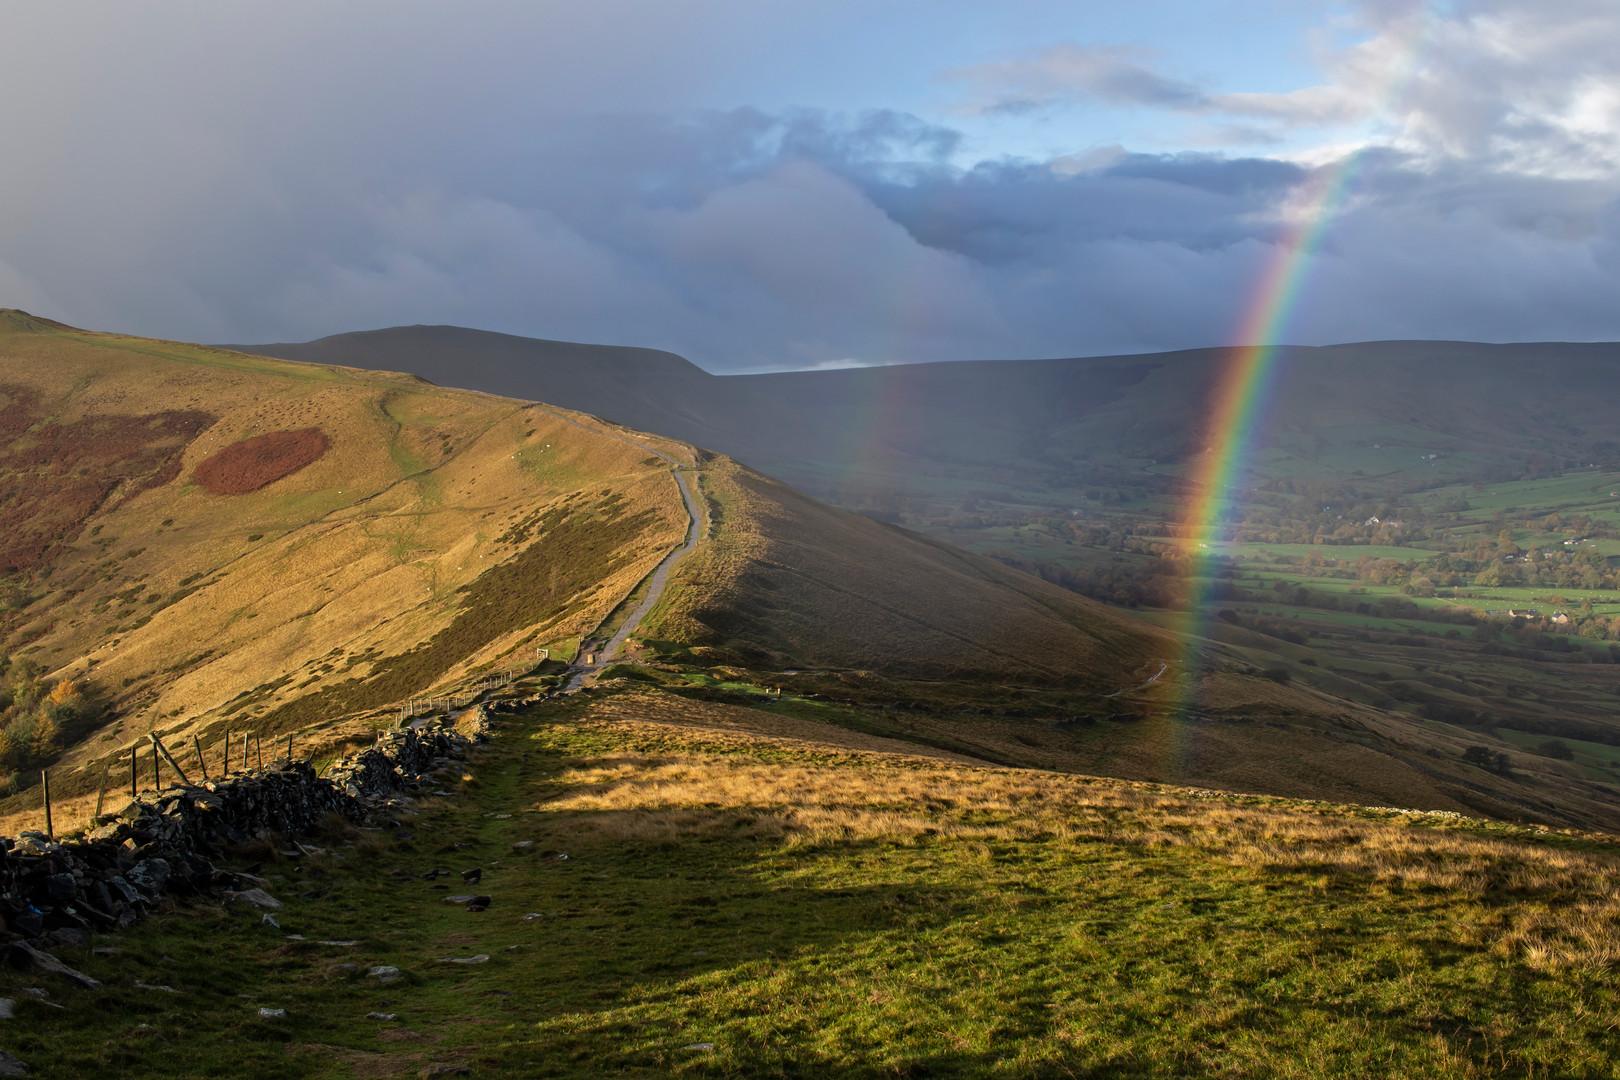 Rainbow Over the Great Ridge, Peak District, England